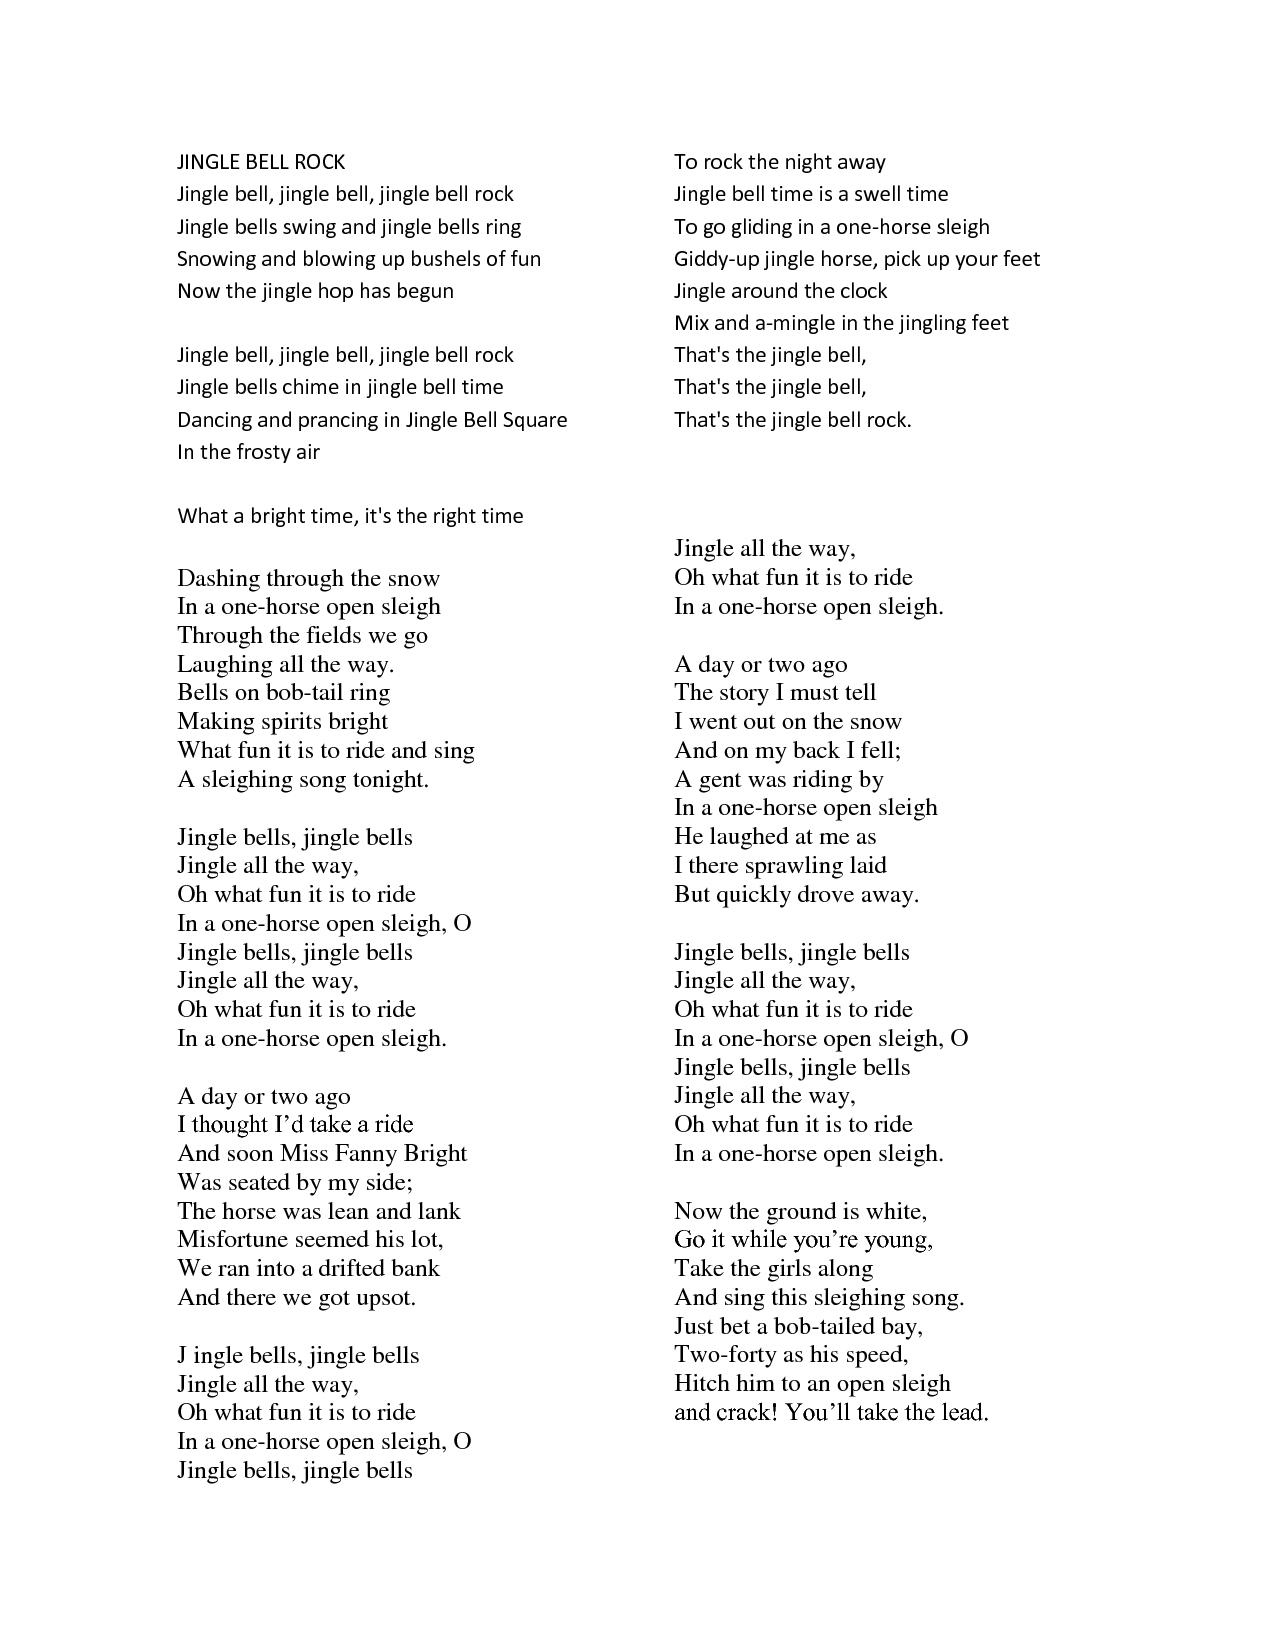 lyrics to jingle bell rock scope of work template